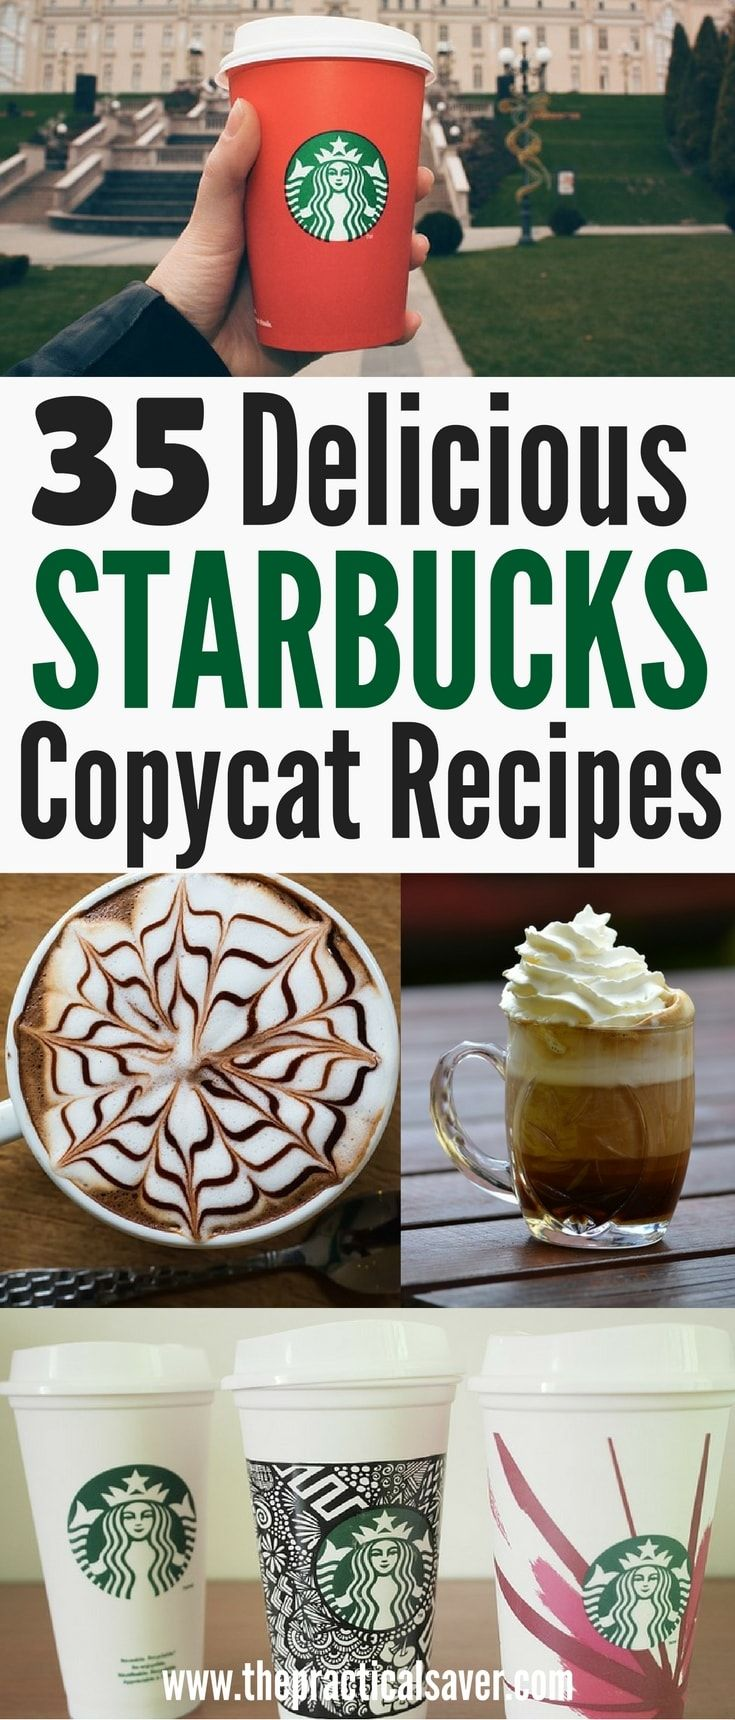 35 Delicious Starbucks Copycat Recipes | Starbucks rezepte ...